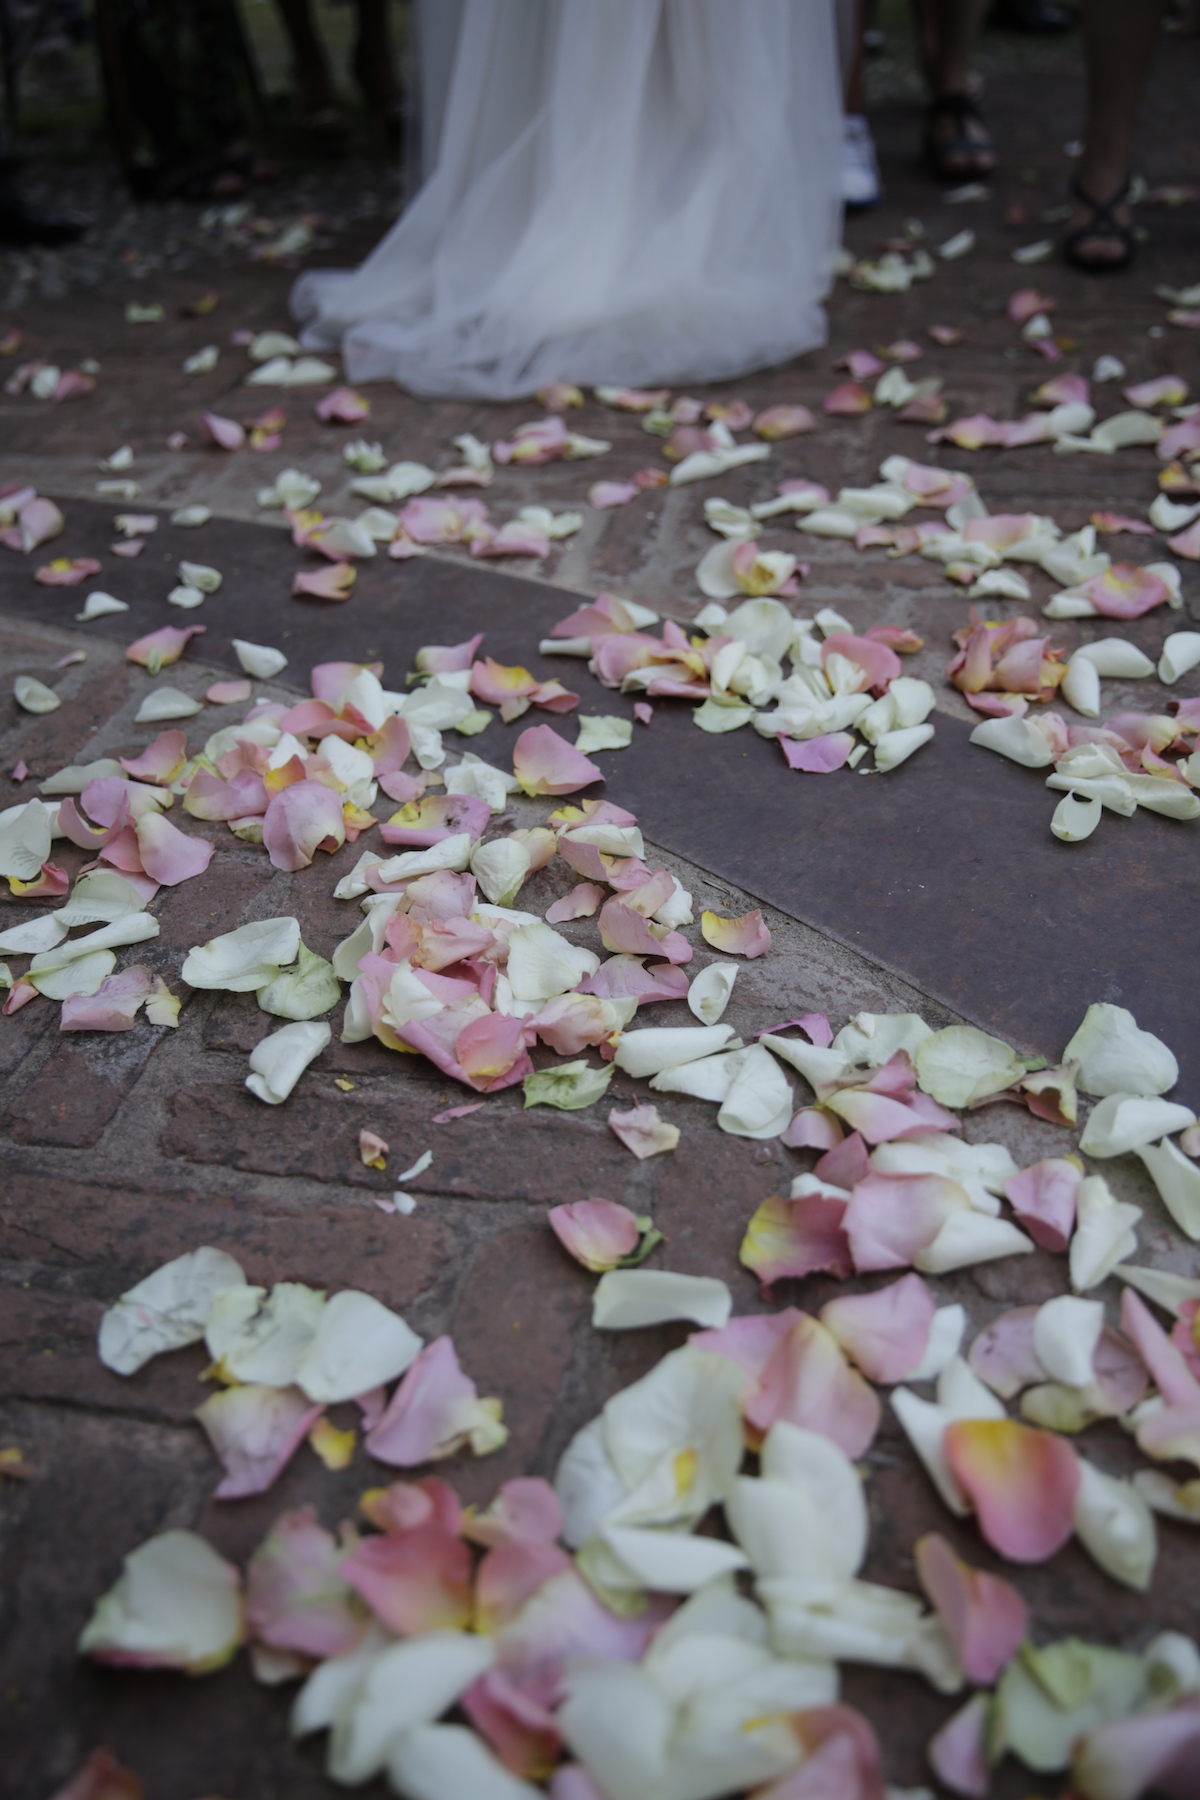 aa-petali-esterno-chiesa-01